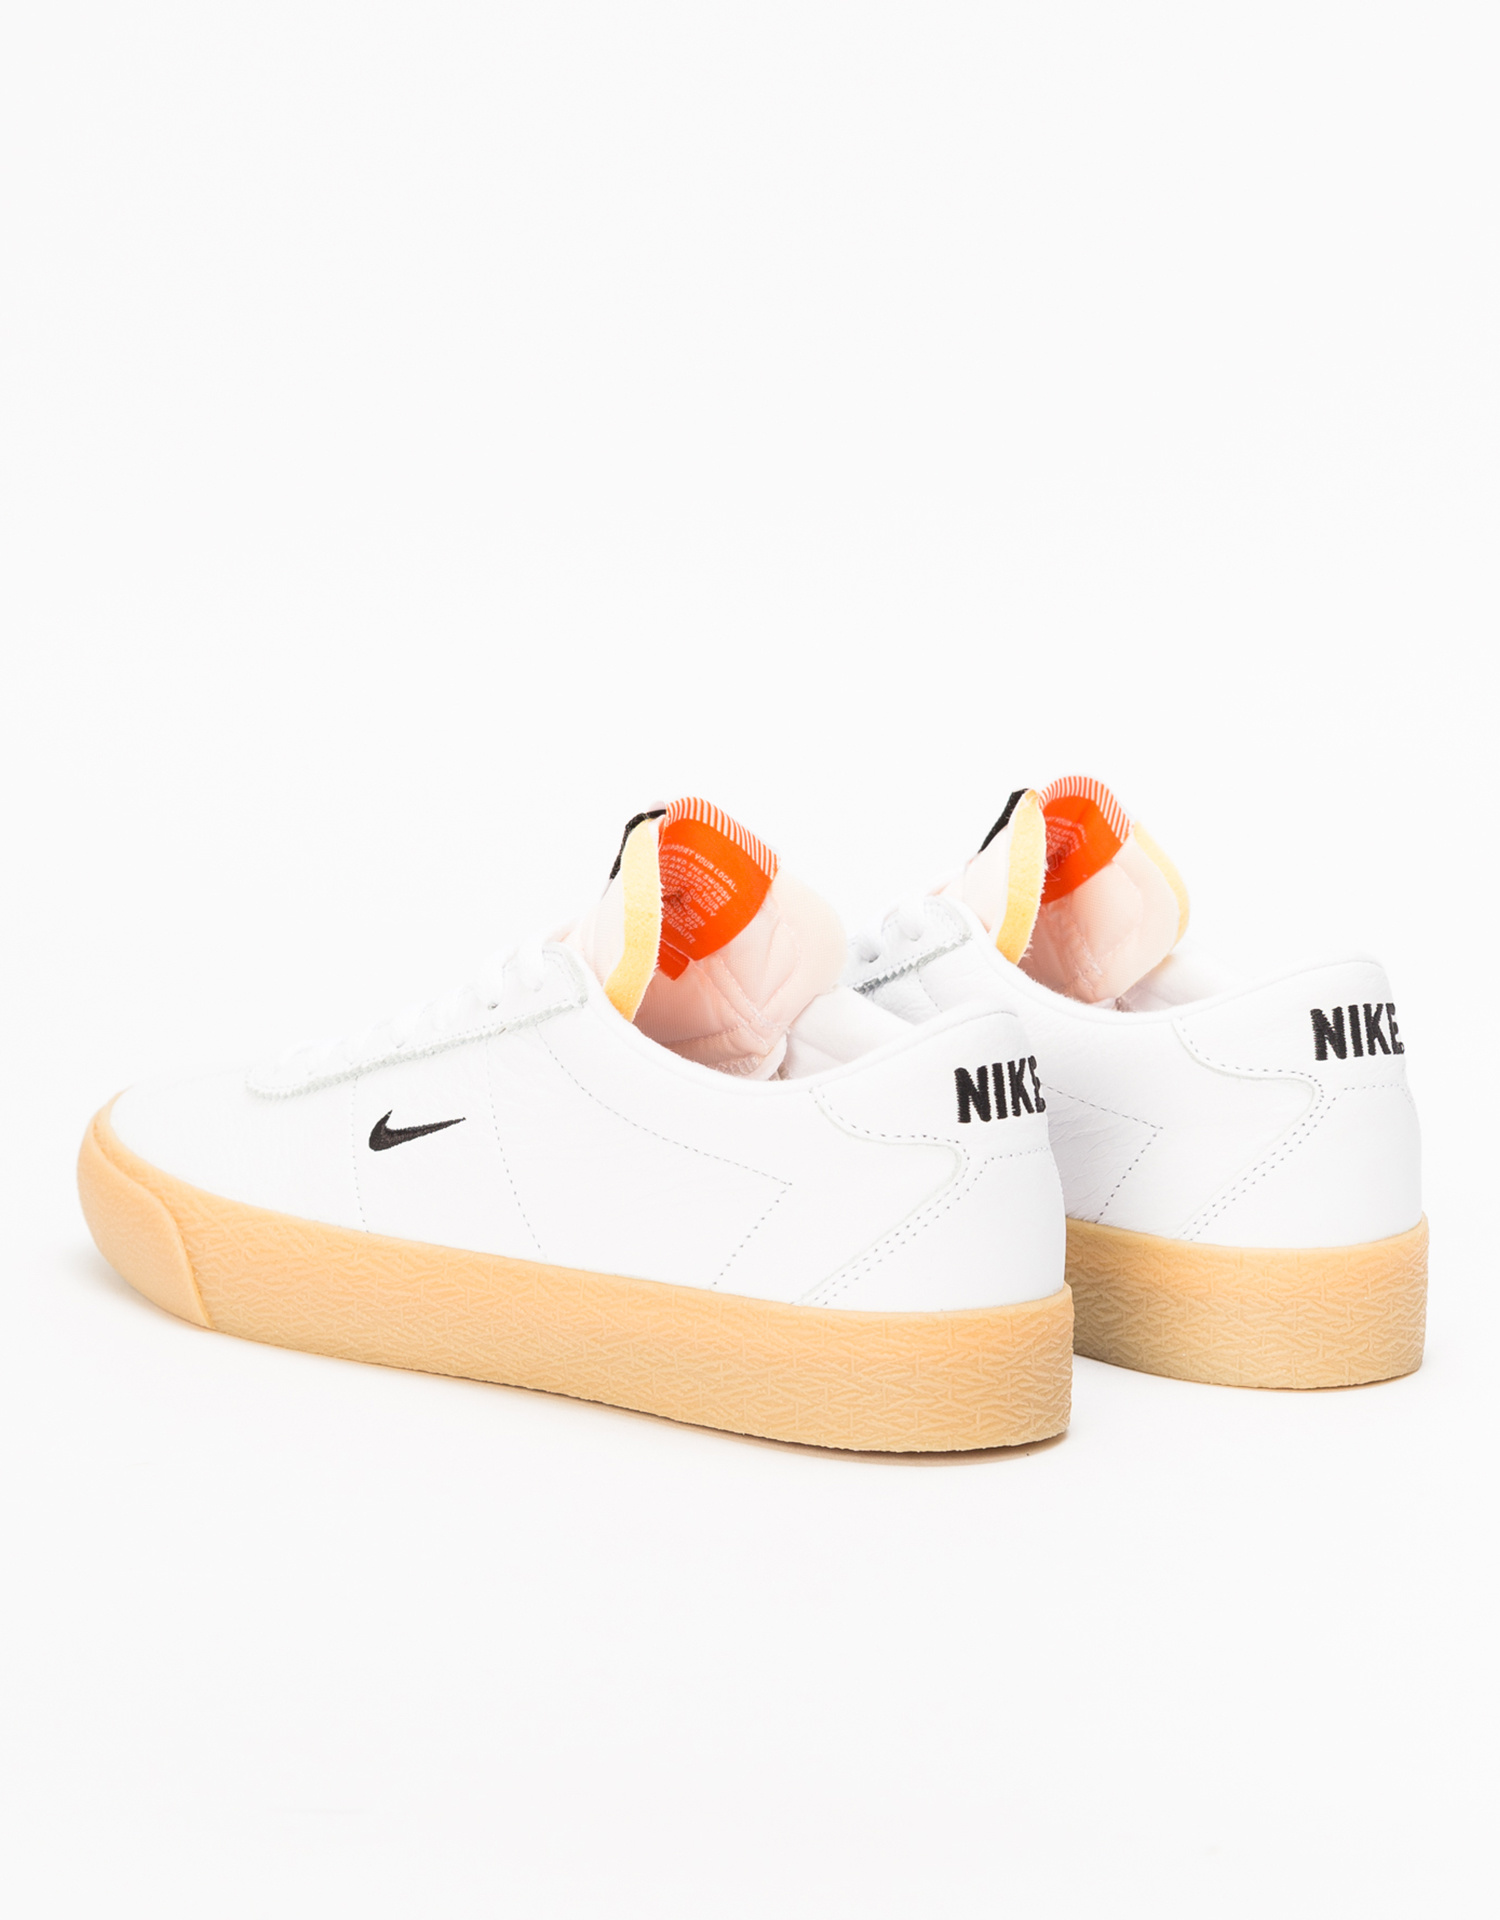 outlet store 5cbe5 d6d98 ... Nike SB Zoom Bruin Iso Orange Label White Black-Safety Orange ...